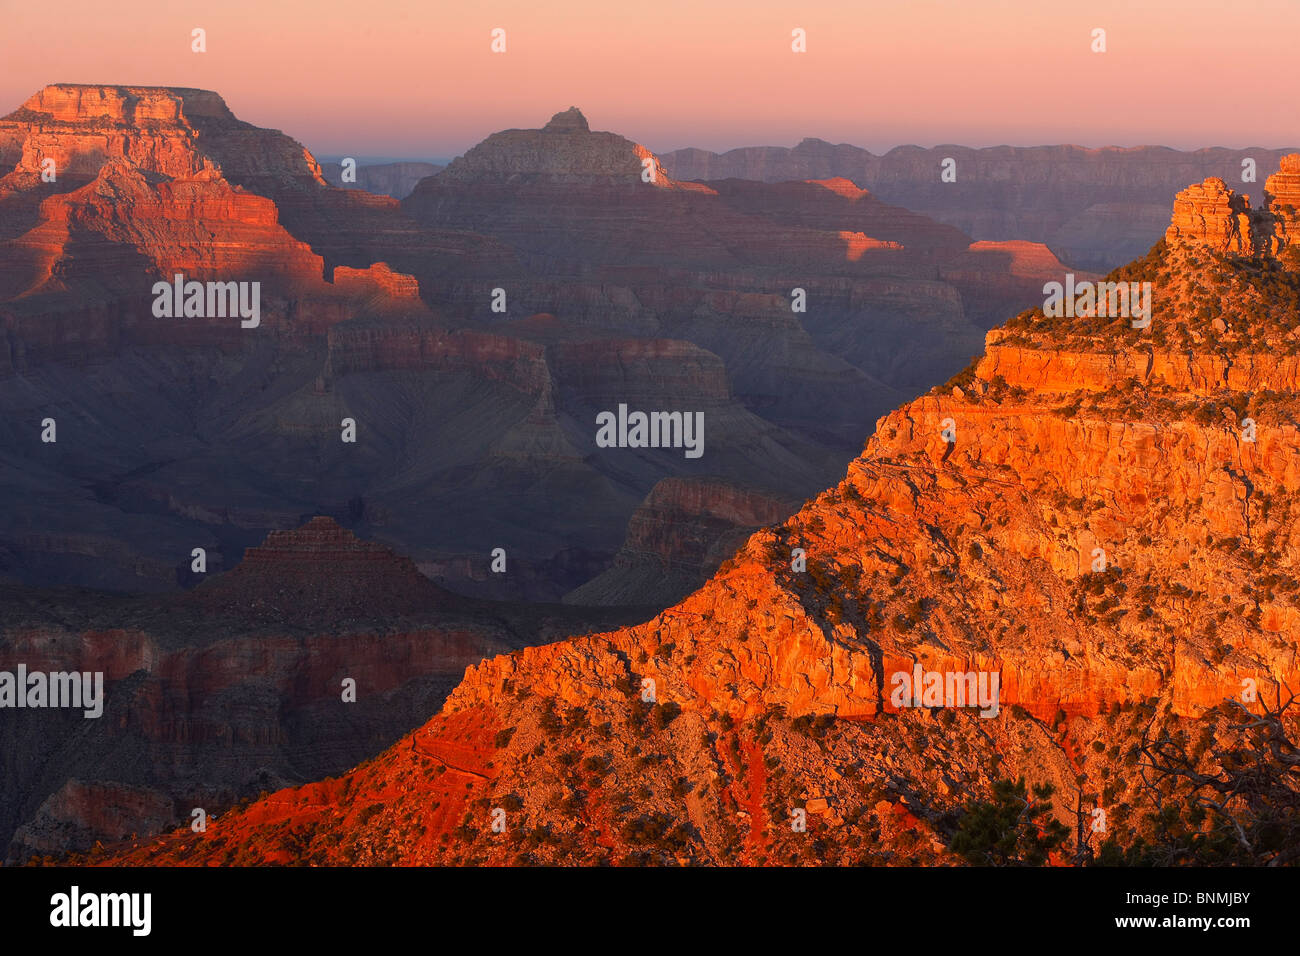 Sunset light from Mather Point, Grand Canyon National Park, Arizona, USA. - Stock Image